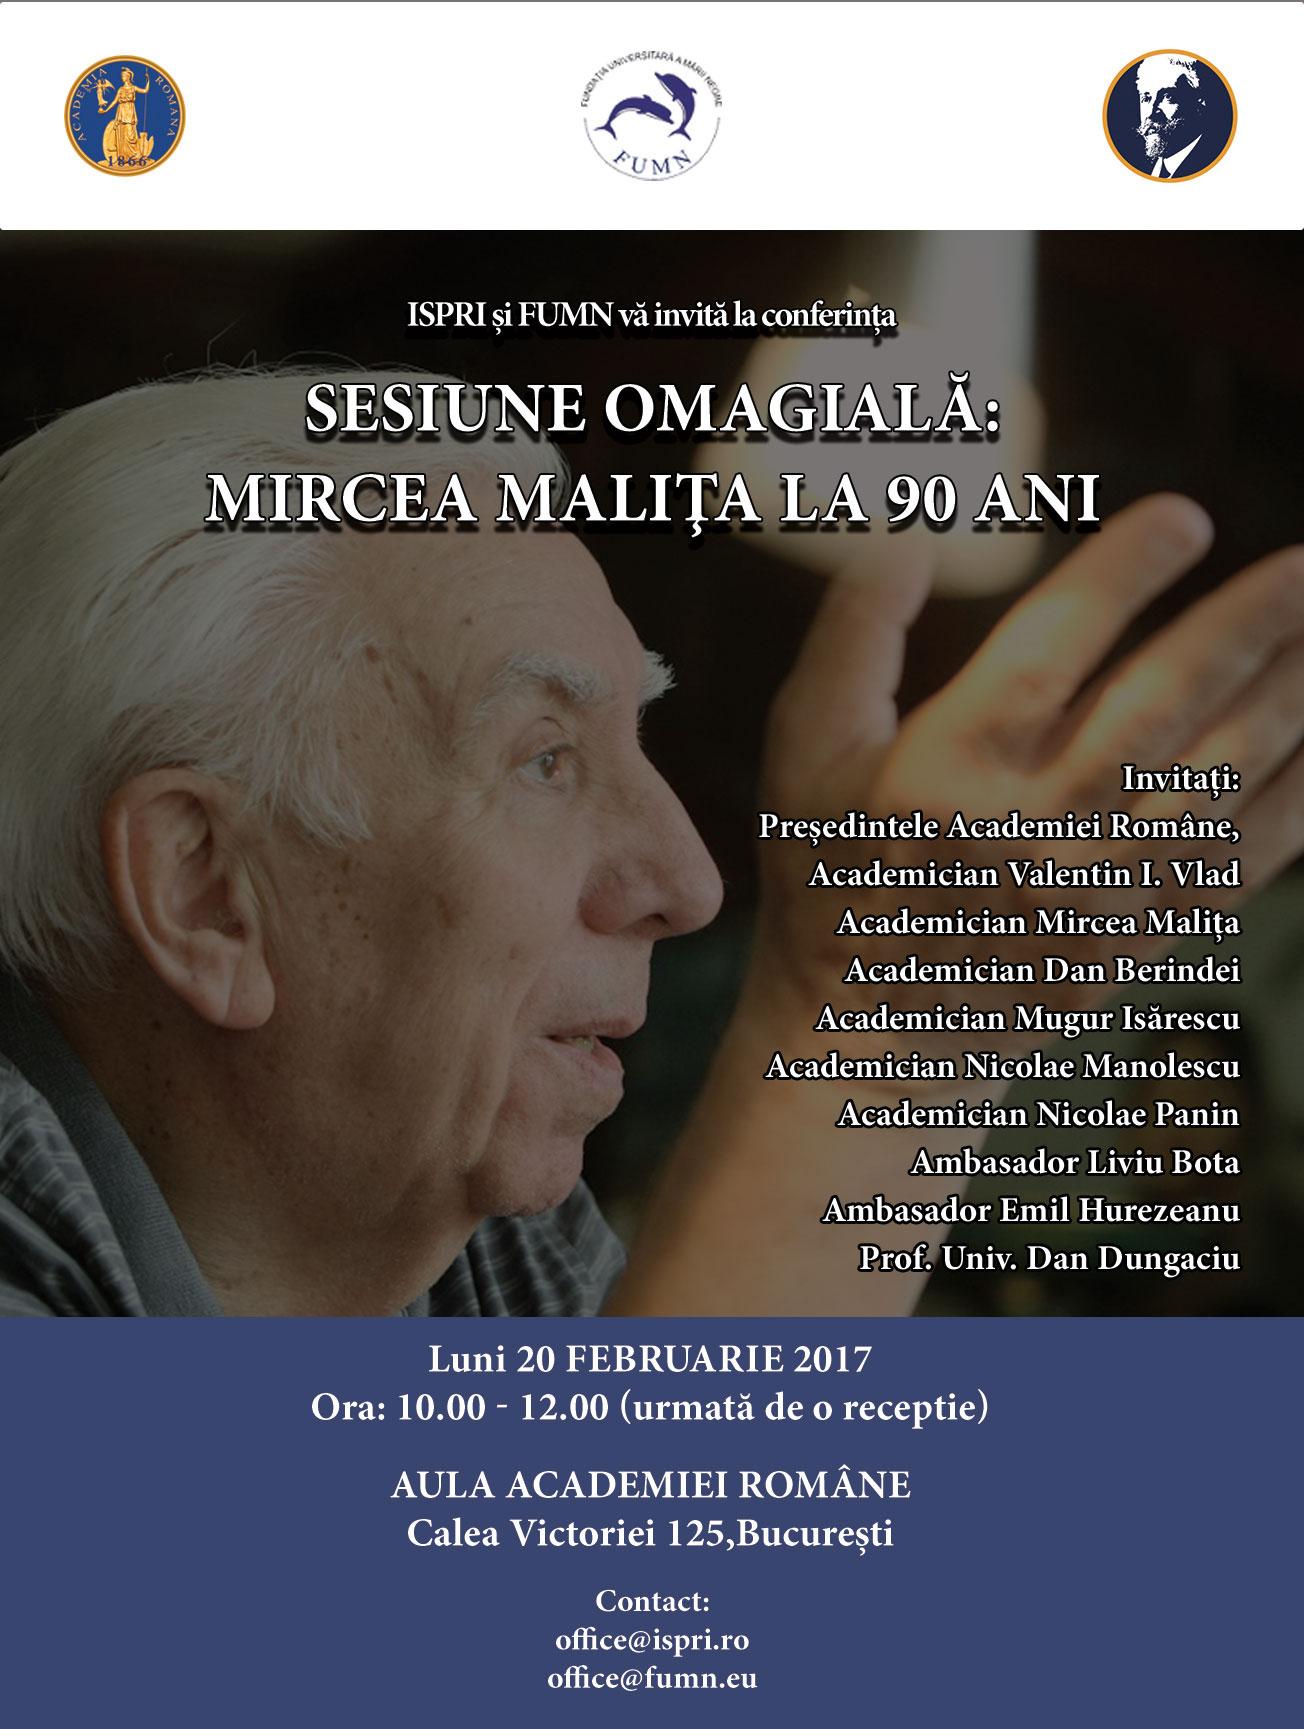 Mircea-Malita-90-de-ani-wb